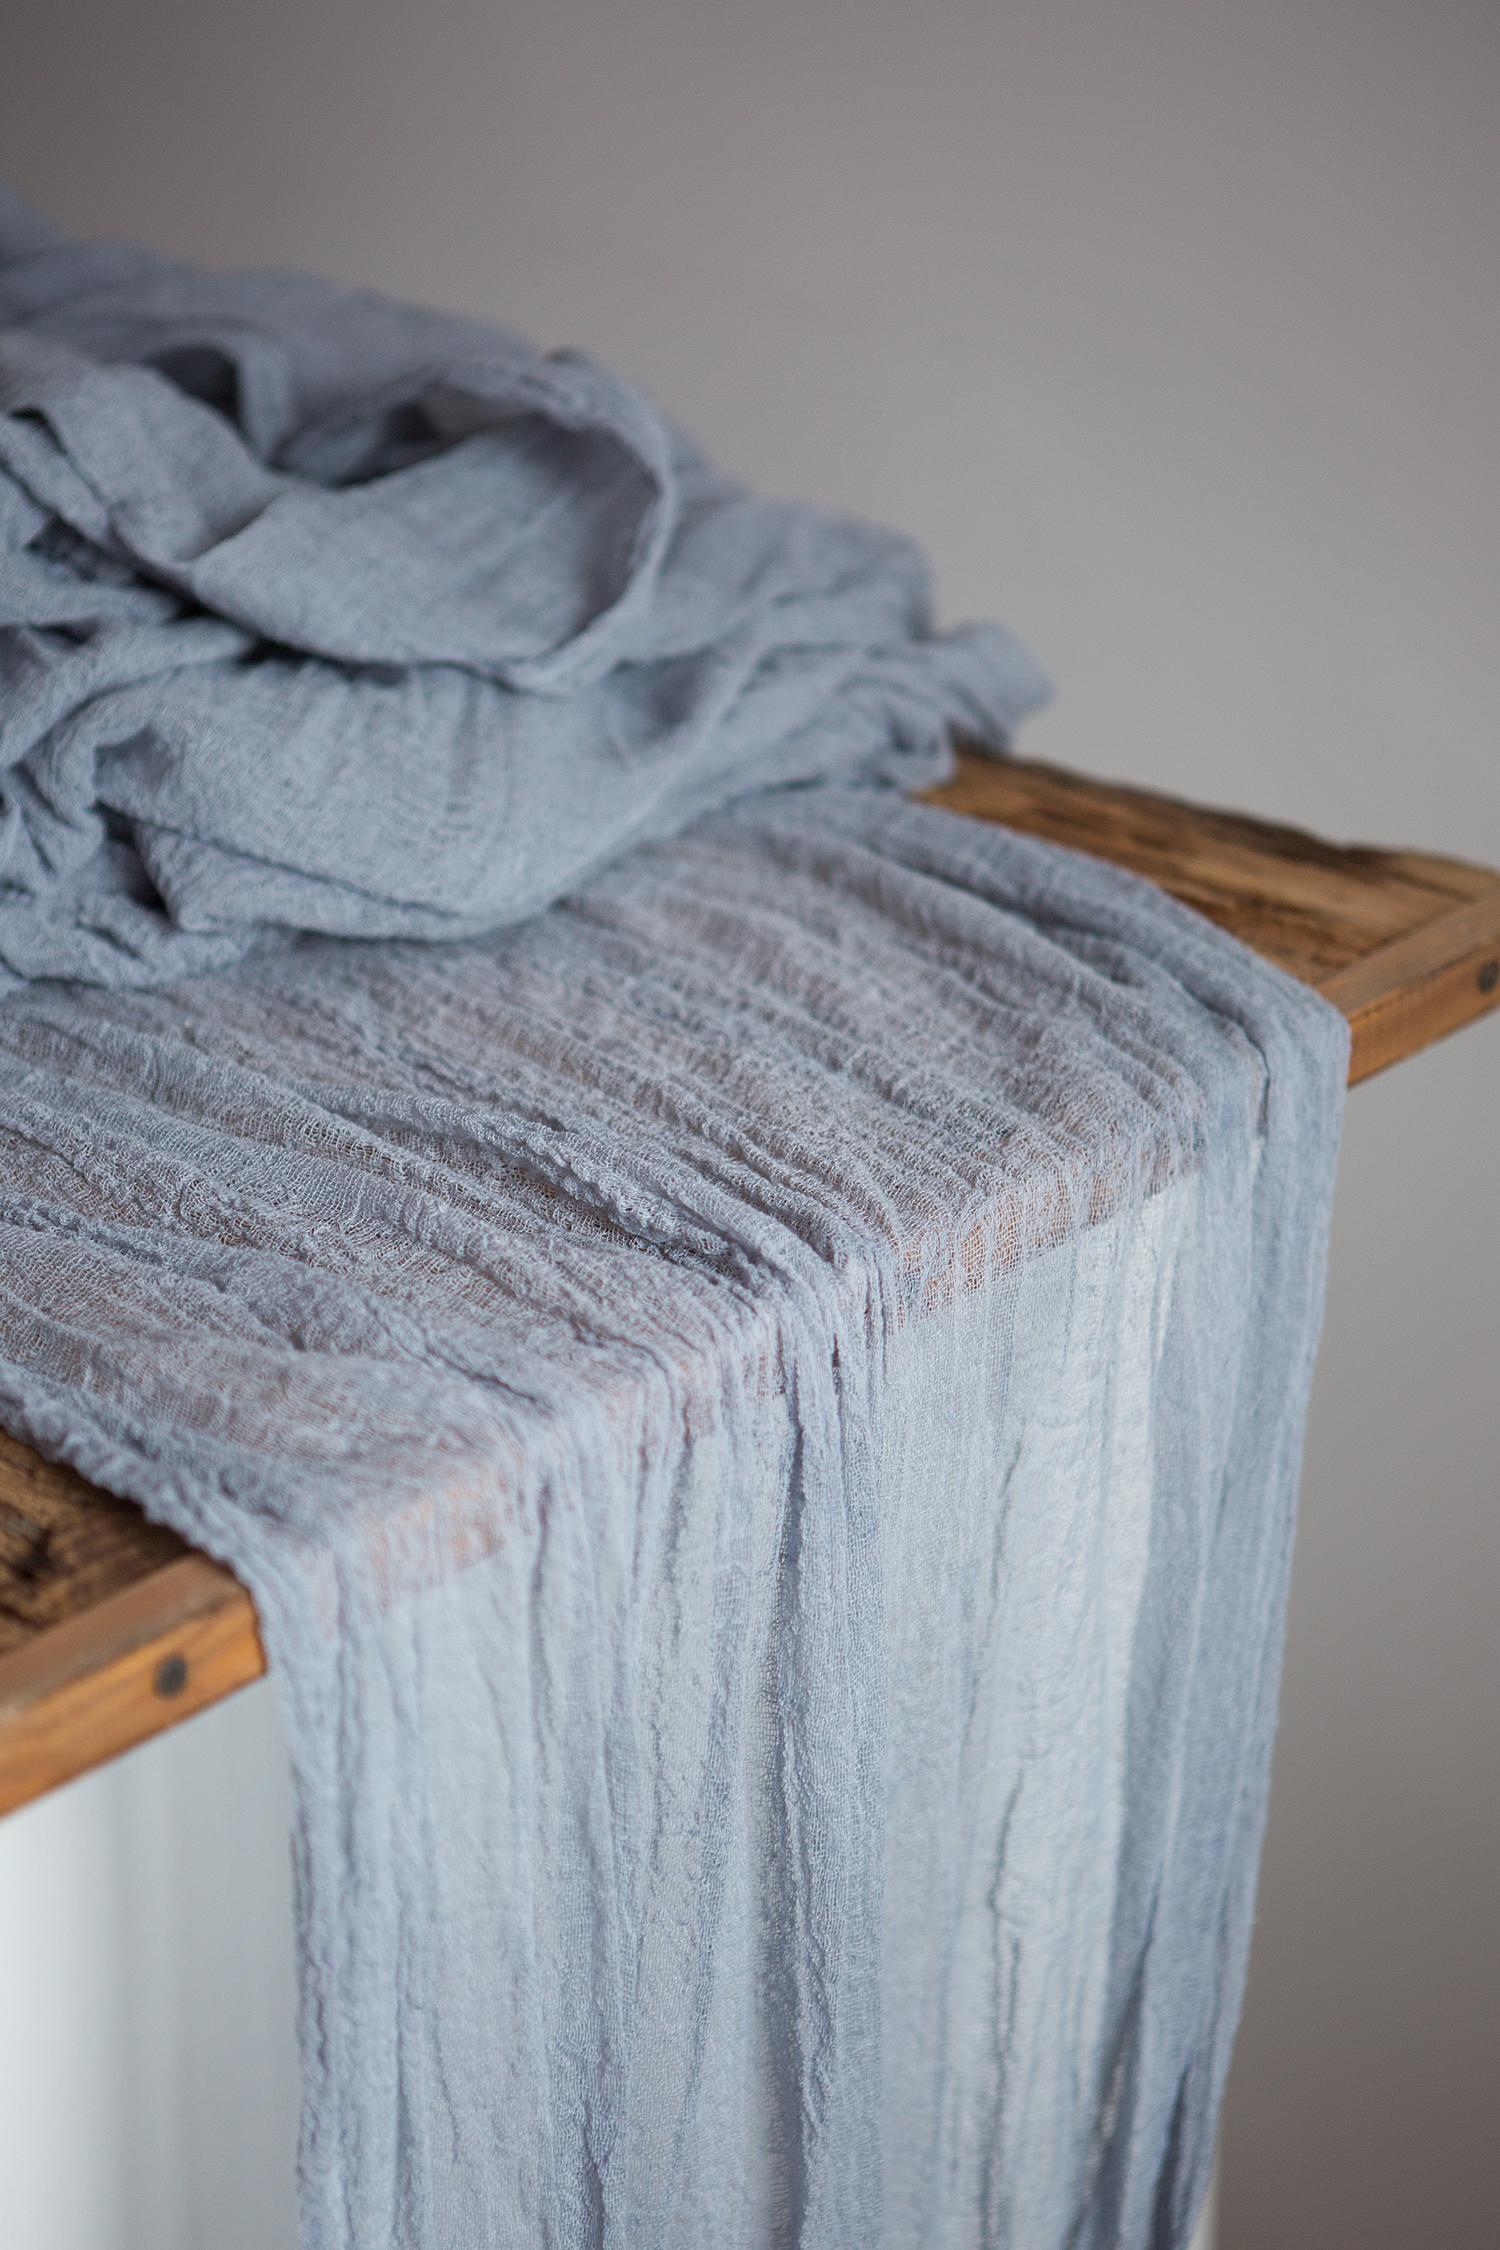 Dusty Blue Gauze Runner Centerpiece Cheesecloth Runner Rustic